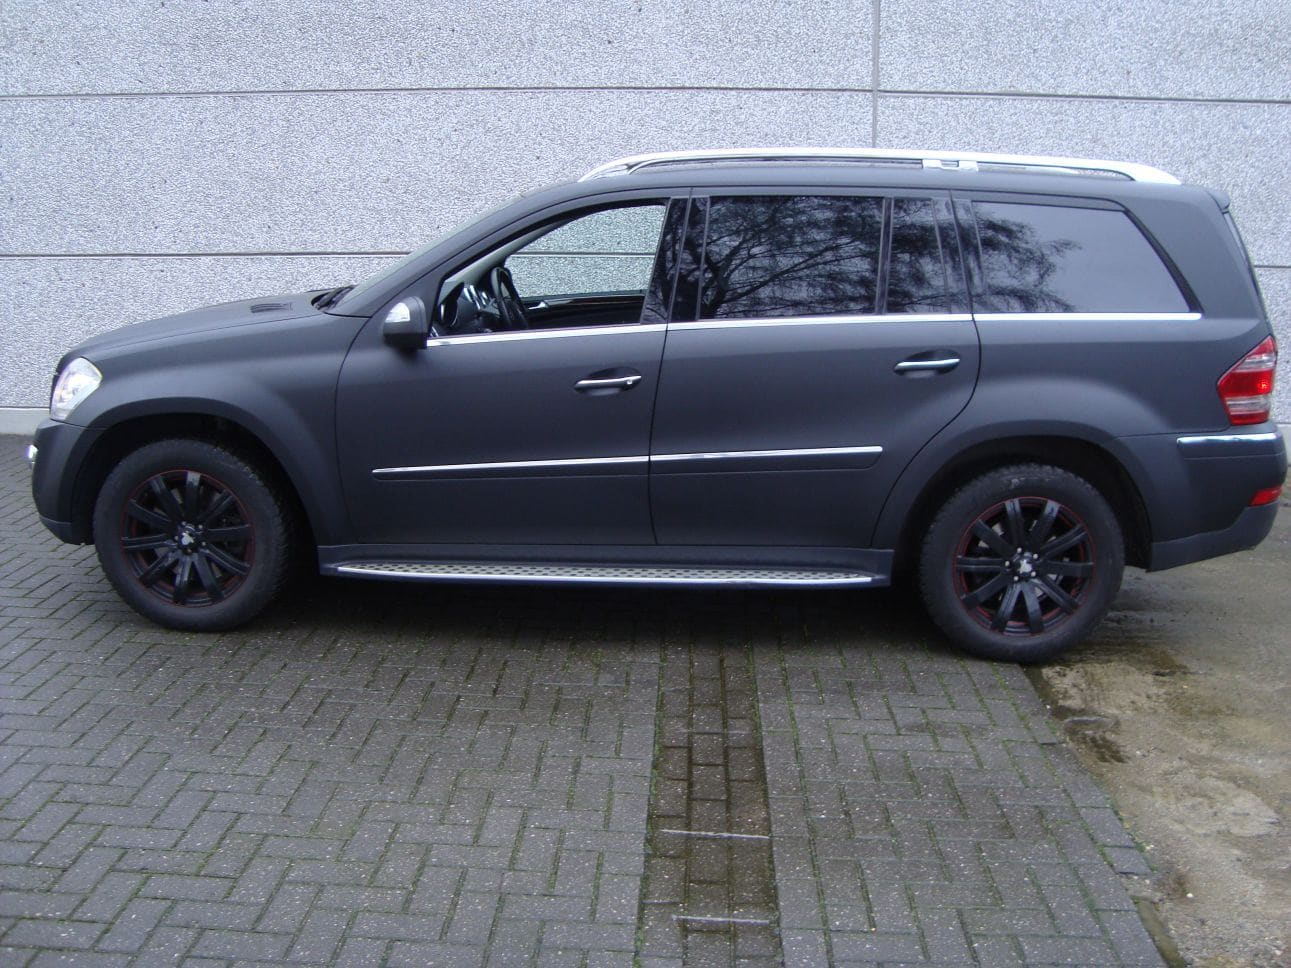 Mercedes GL met Mat Zwarte Wrap, Carwrapping door Wrapmyride.nu Foto-nr:6282, ©2021